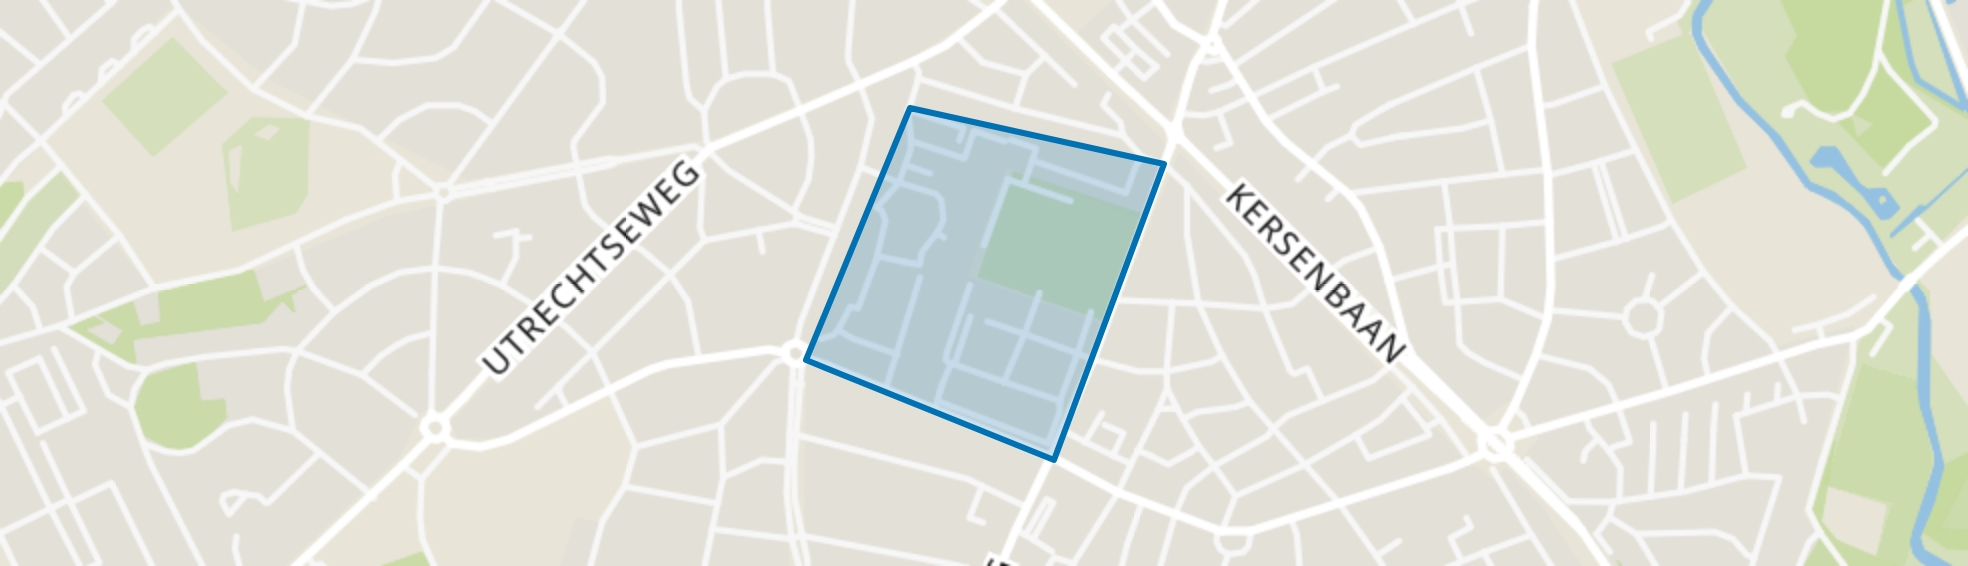 Juliana van Stolberg, Amersfoort map